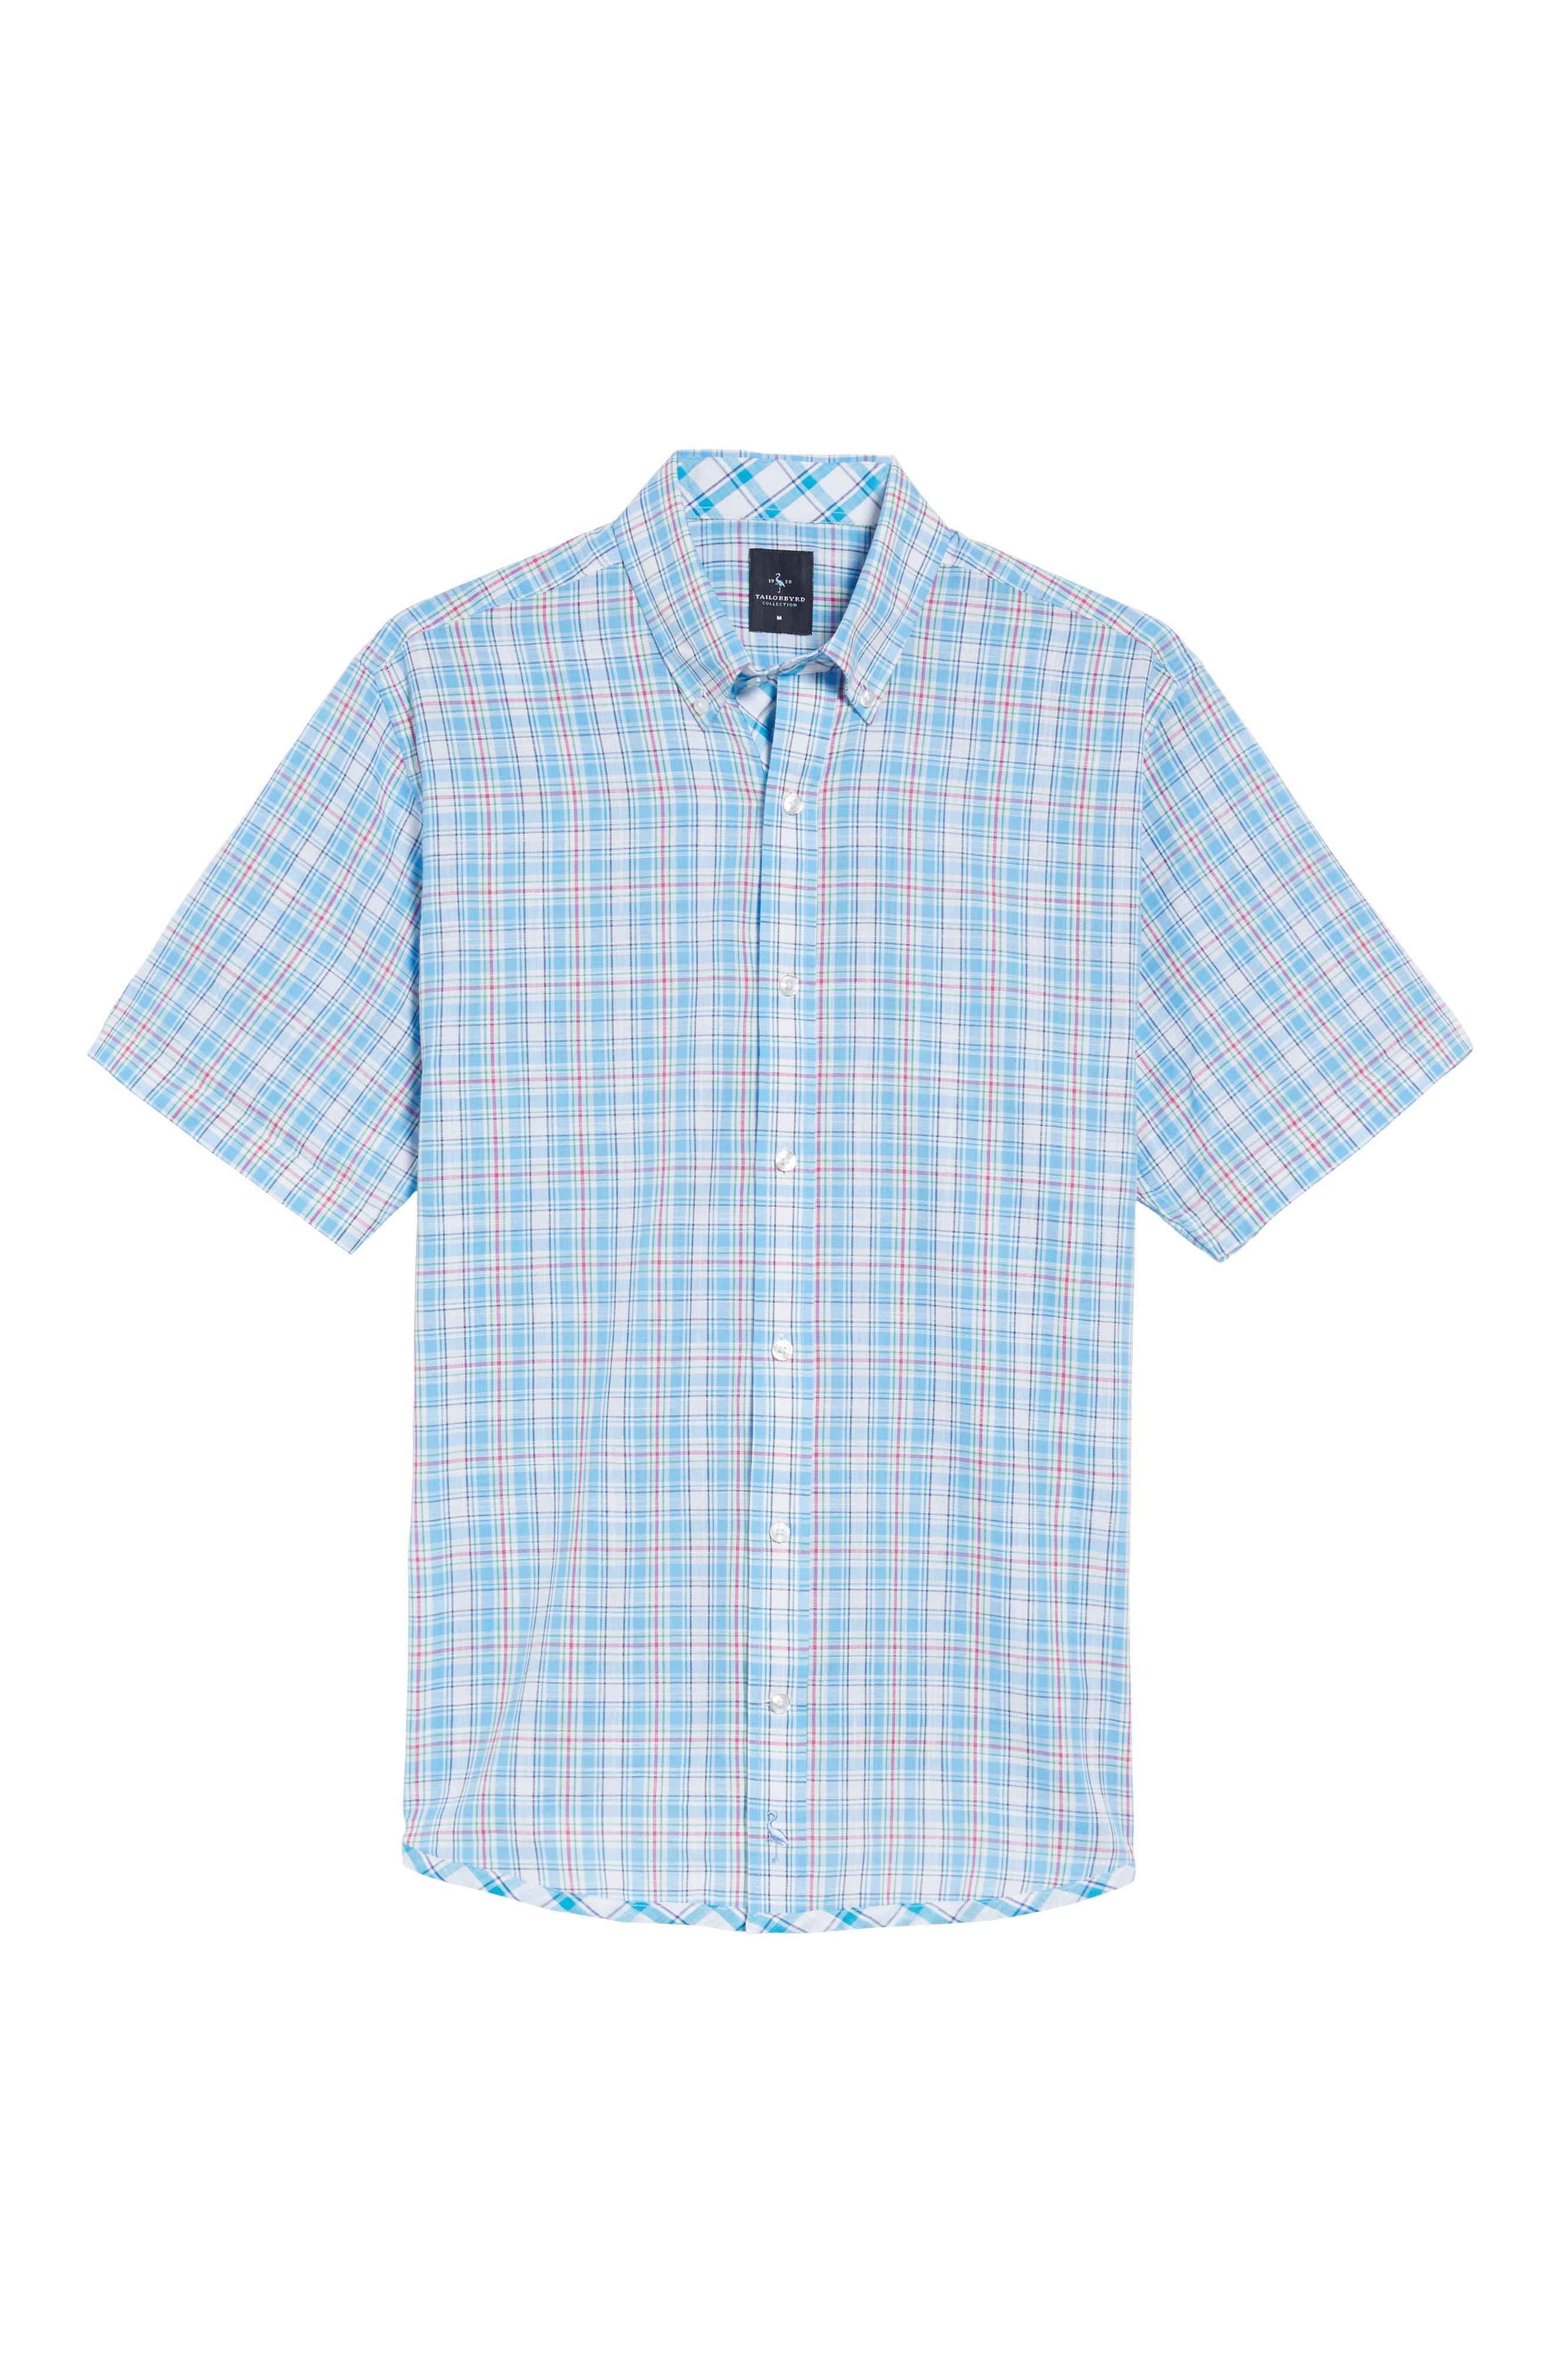 Nectarine Sport Shirt,                             Alternate thumbnail 6, color,